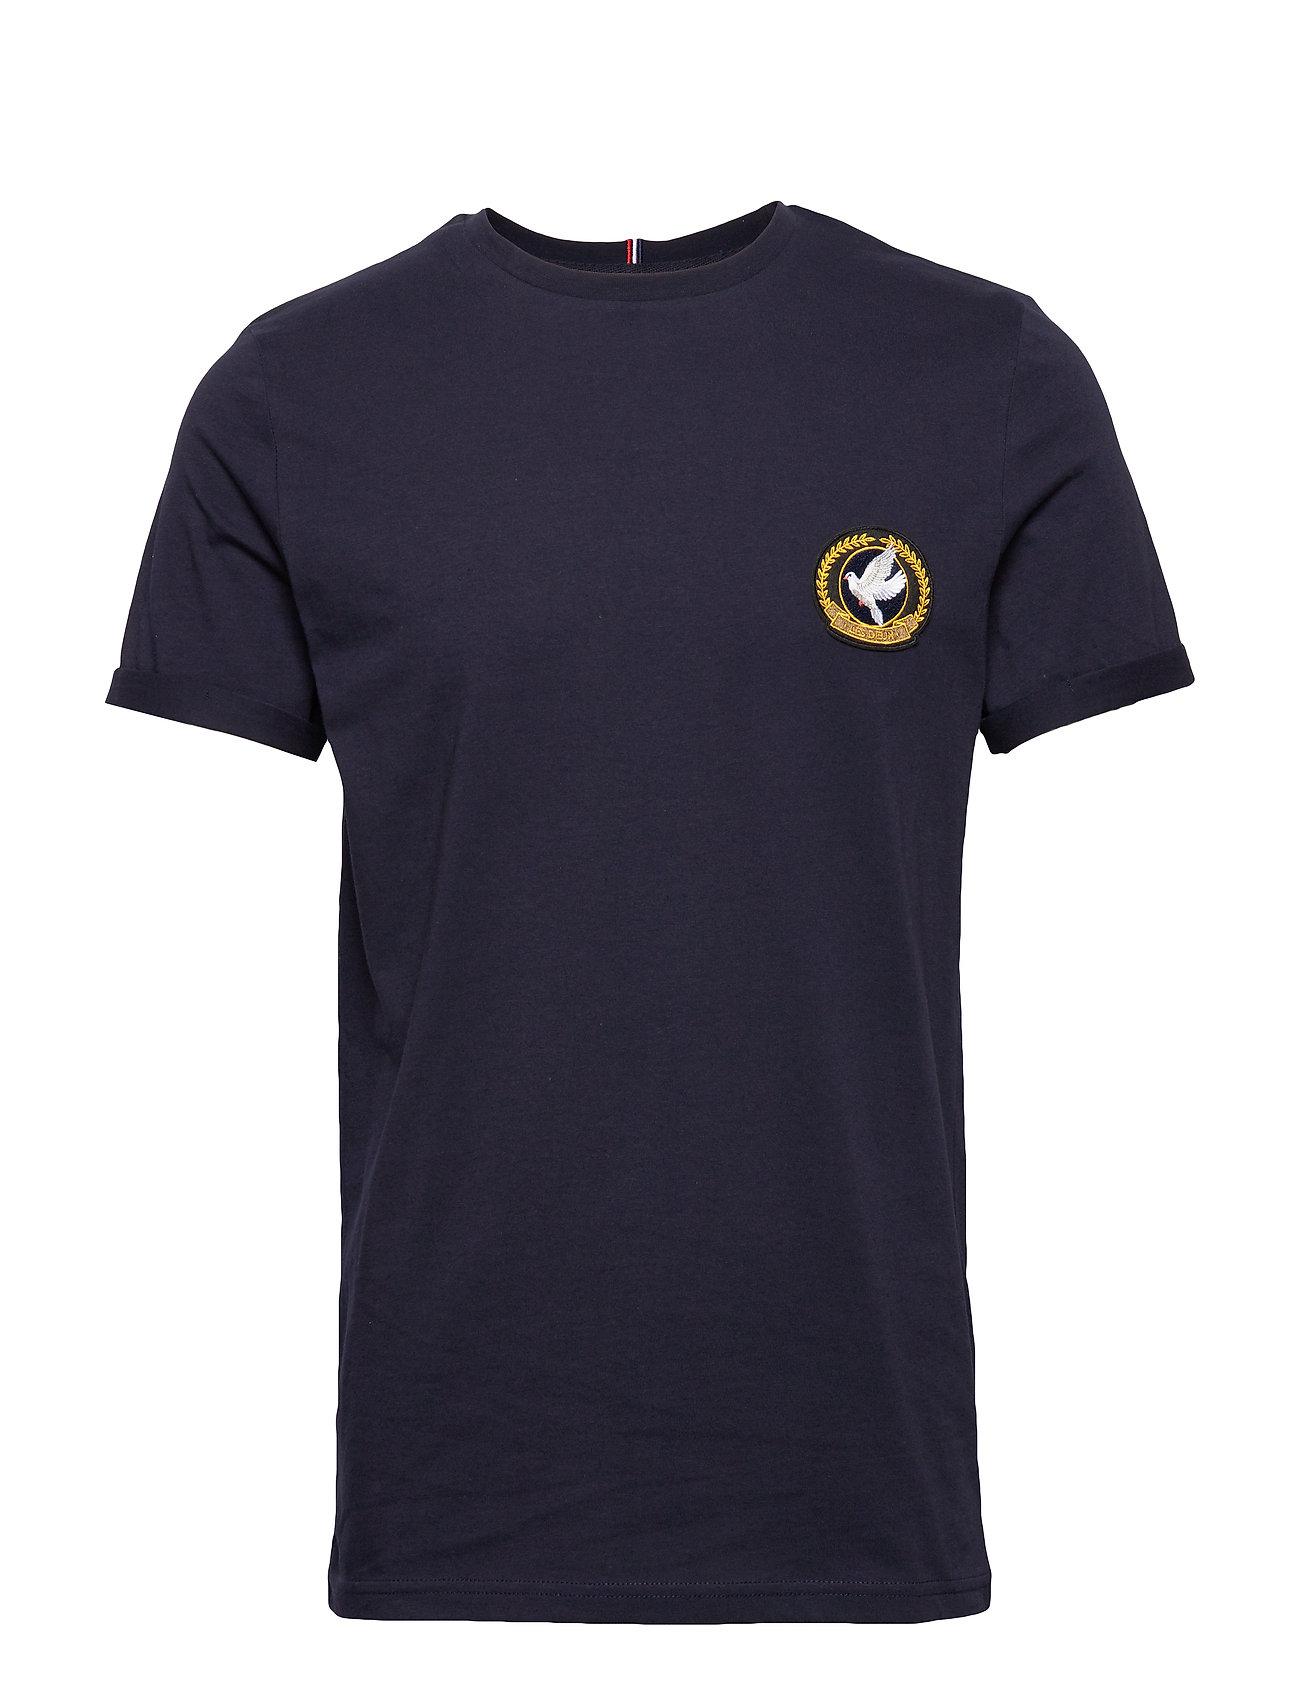 Les Deux Liberty T-Shirt - 4646-DARK NAVY